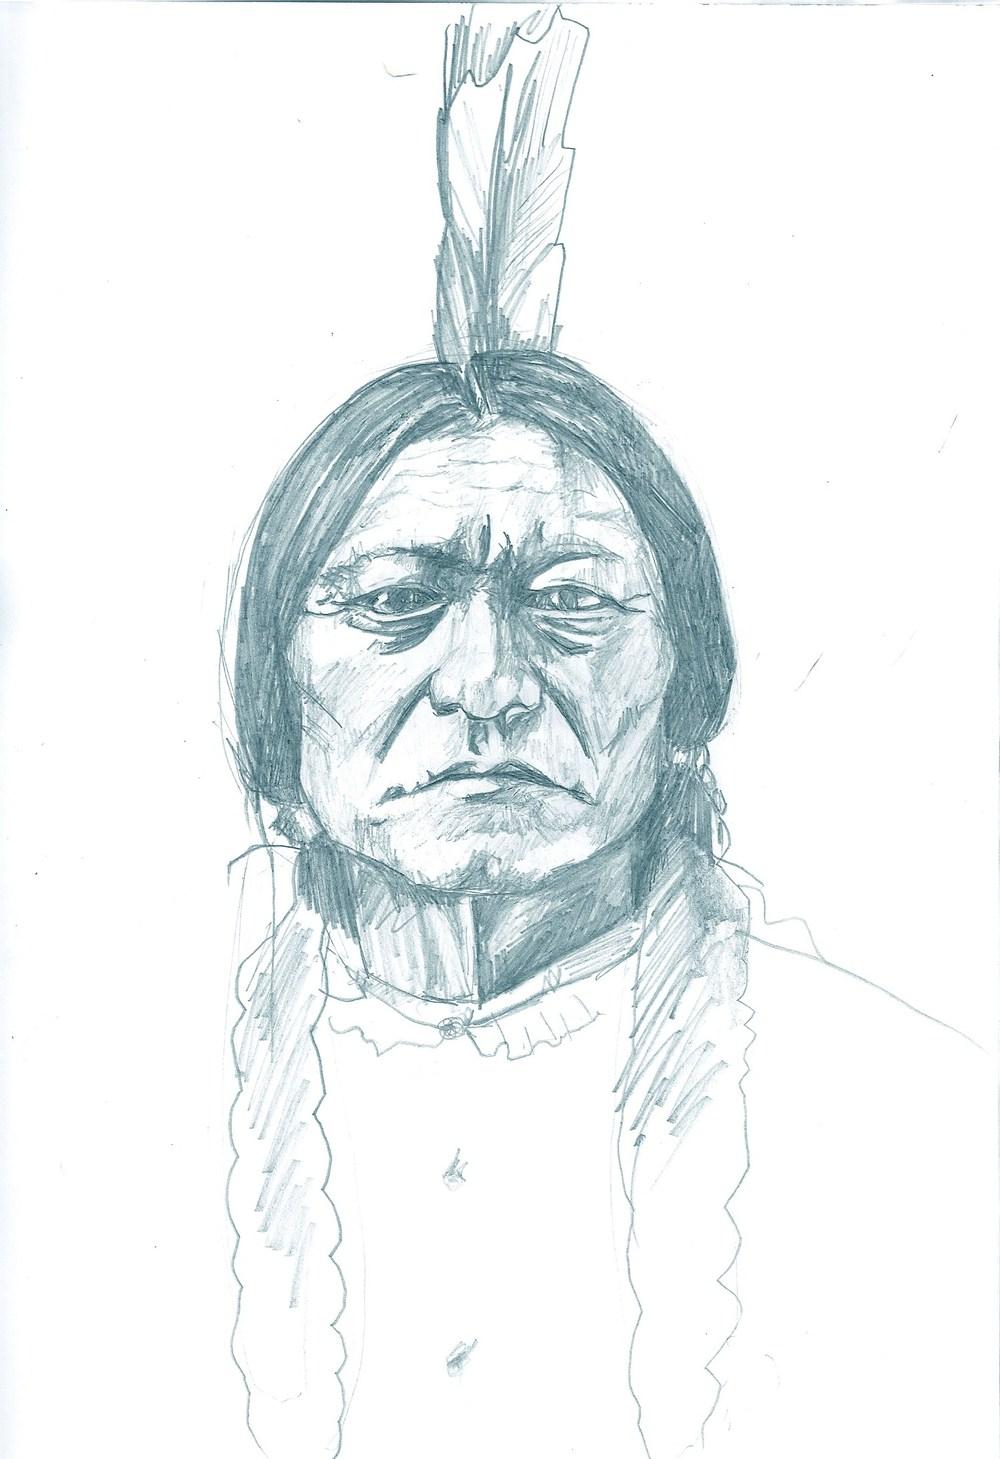 Sitting Bull Sketch.jpg